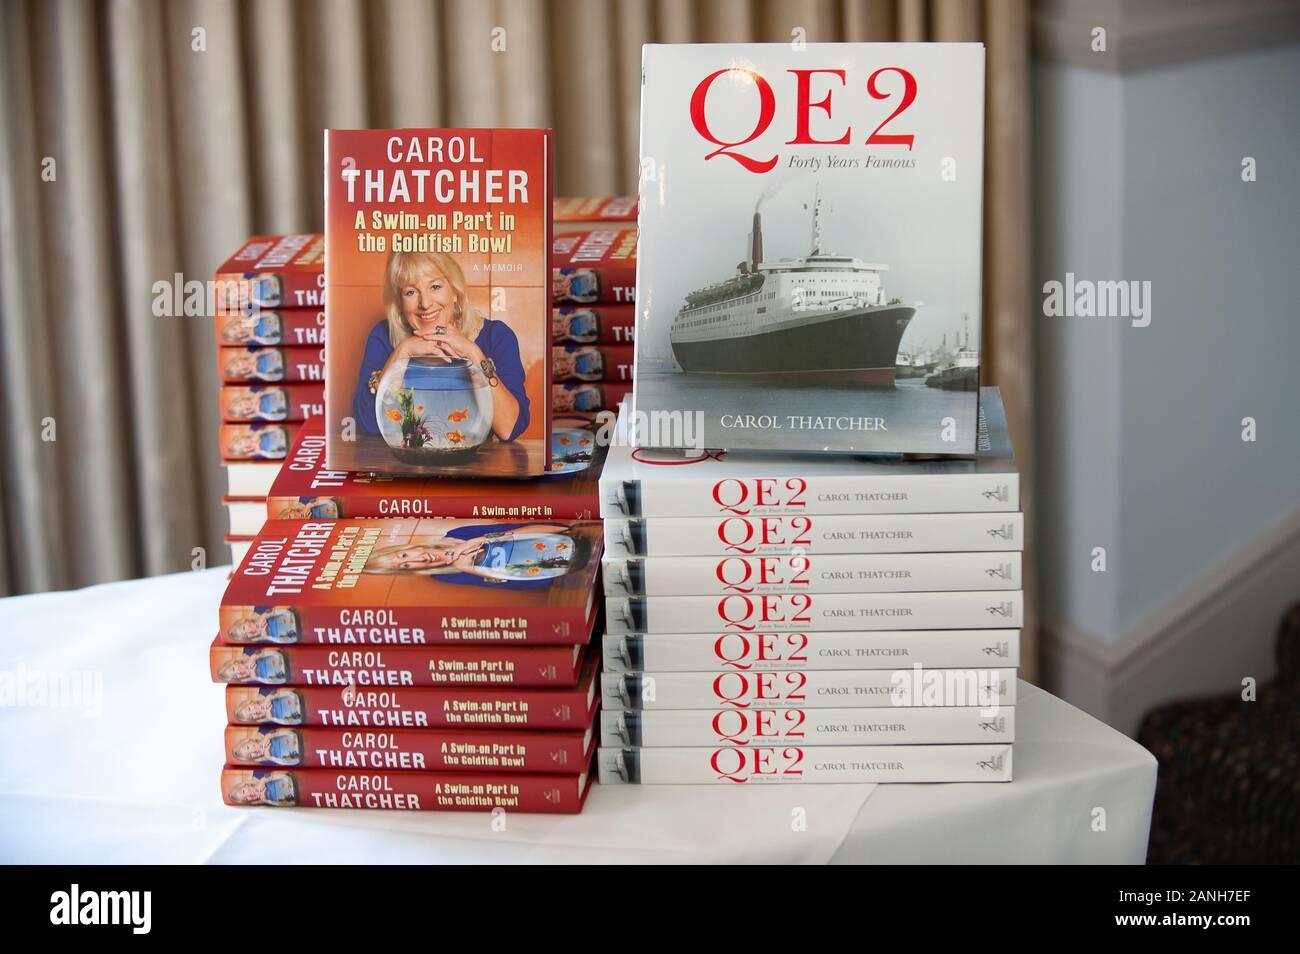 Festival de Windsor, une audience avec Carol Thatcher, Kate Mosse et Lucia van der Post, Harte & Garter Hotel, Windsor, Berkshire, Royaume-Uni. 19 Septembre, 2008. Credit: Maureen McLean/Alamy Banque D'Images